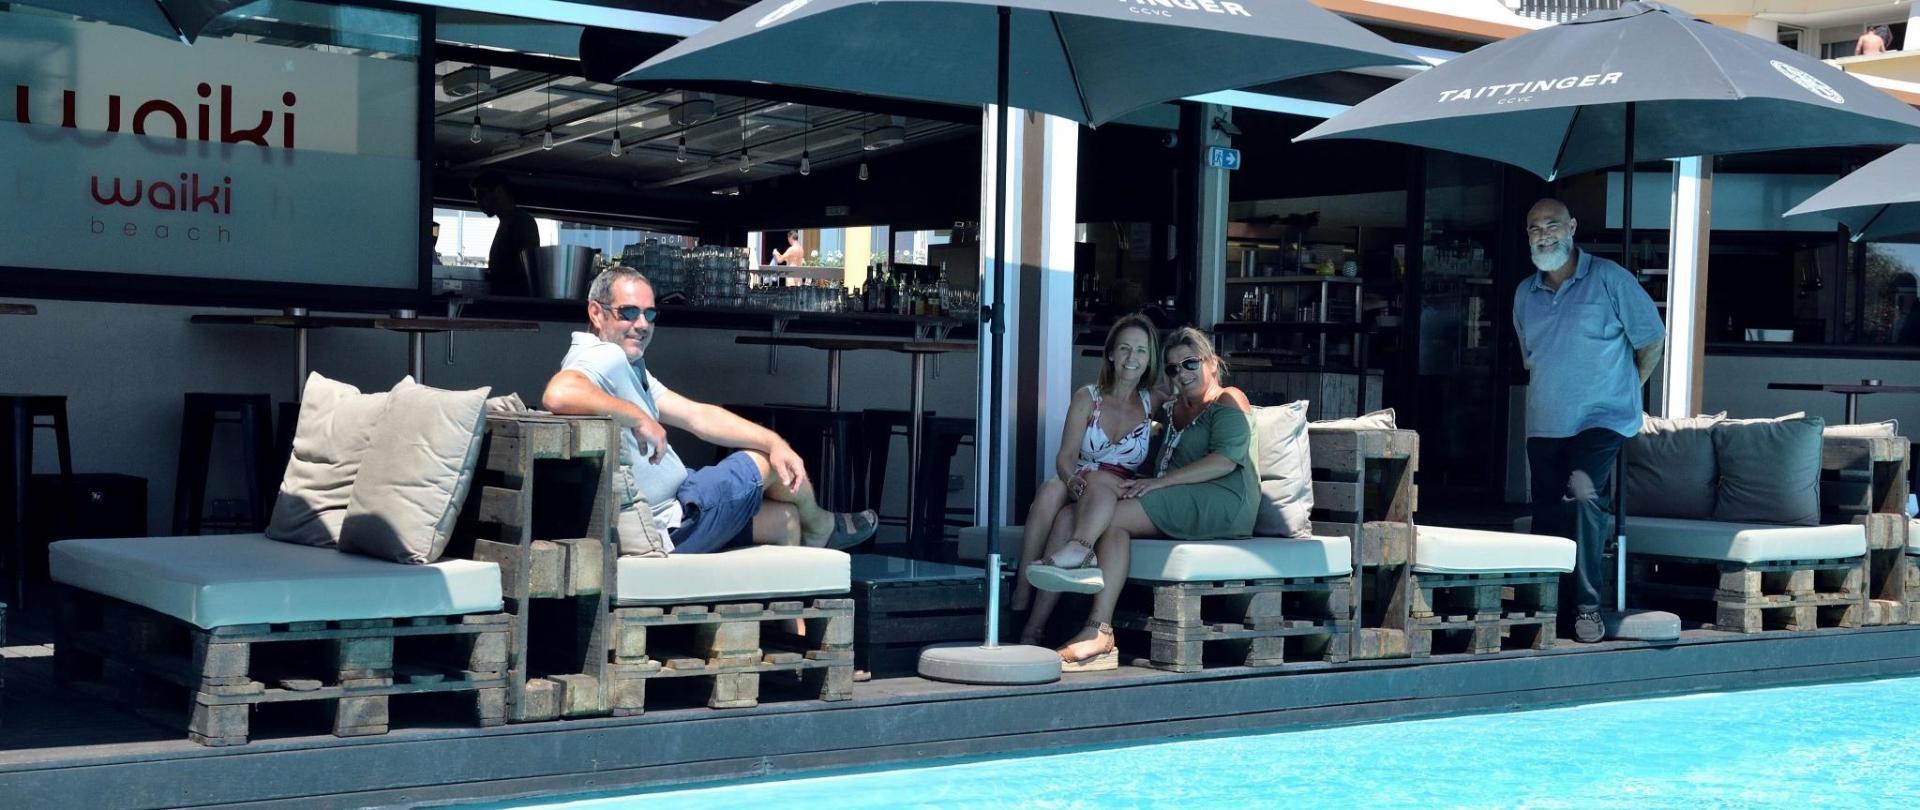 Waiki Beach Restaurant.jpg